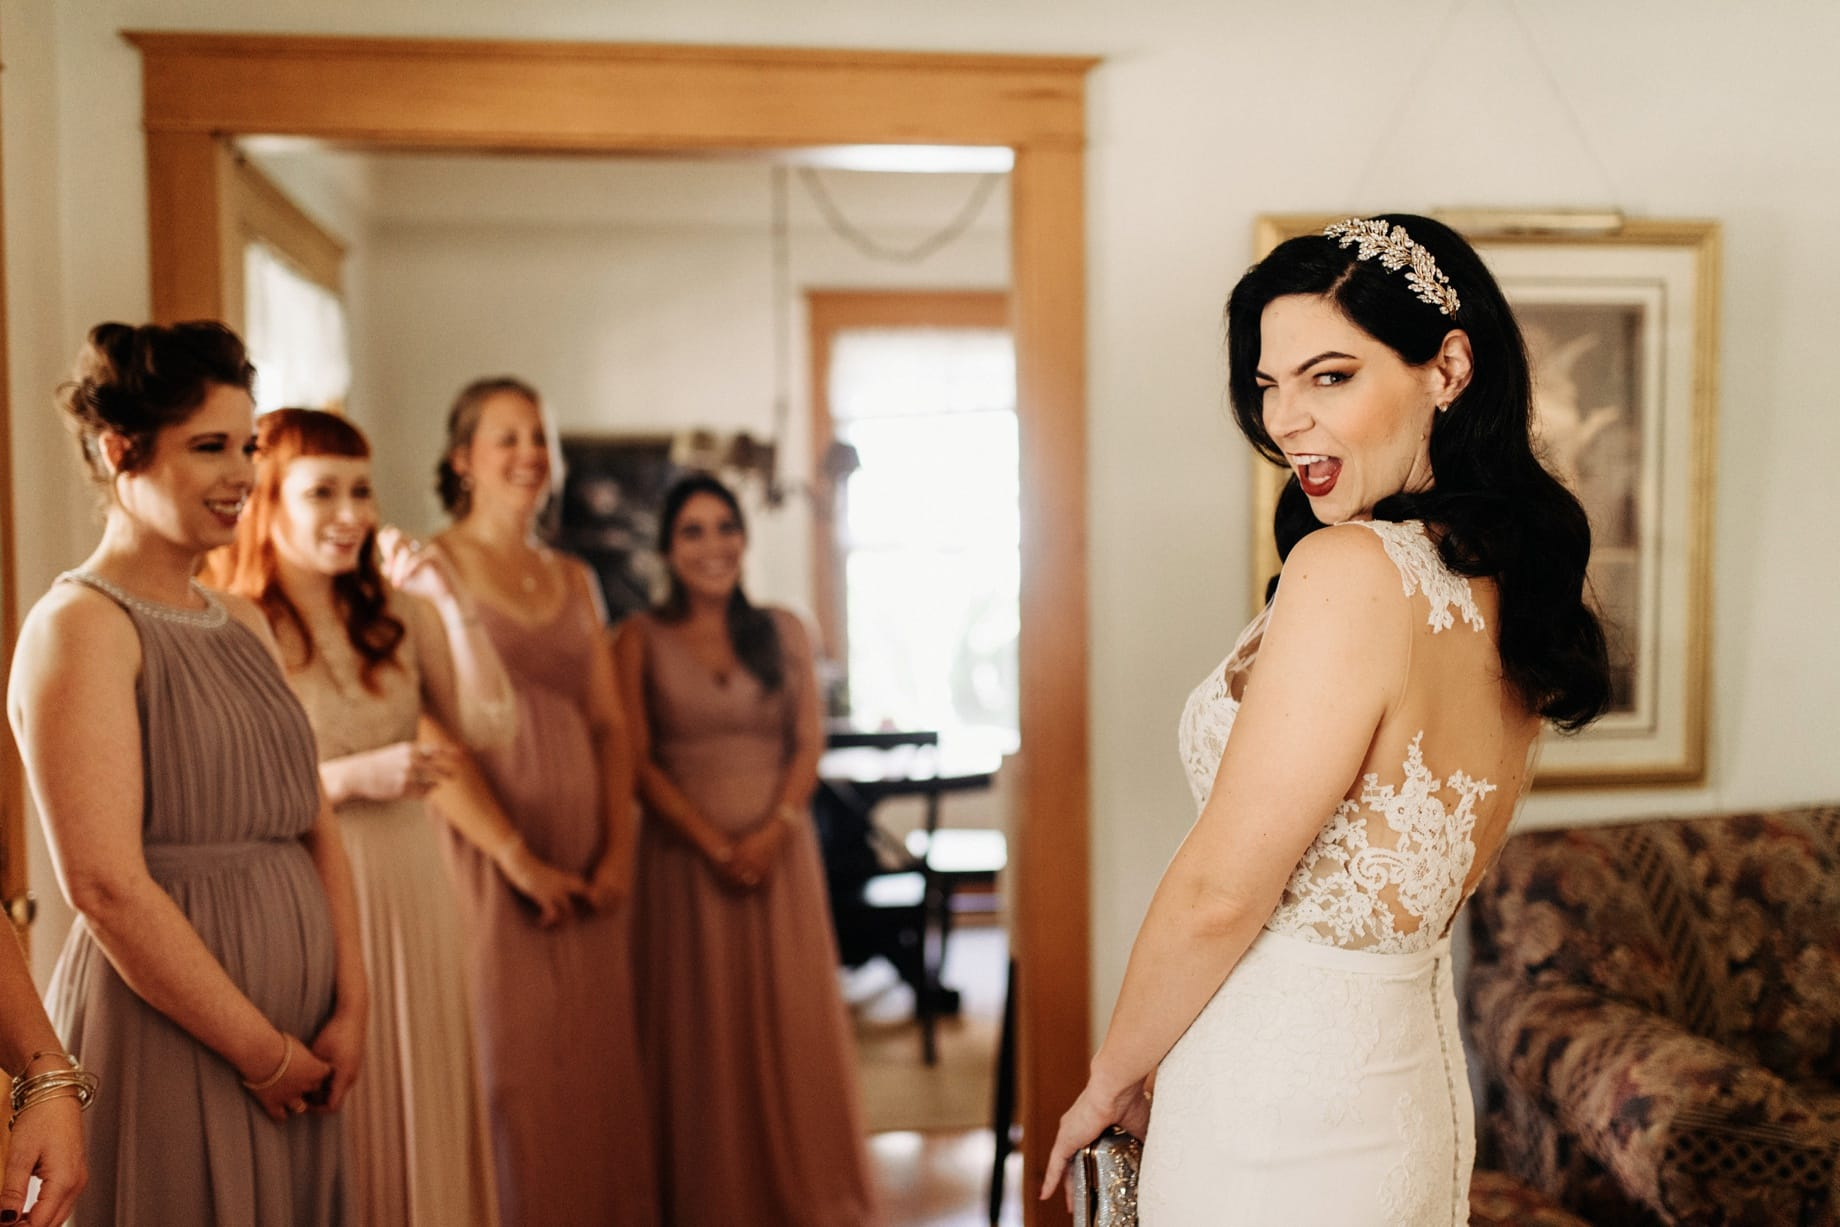 bride revealing herself to her bridesmaids